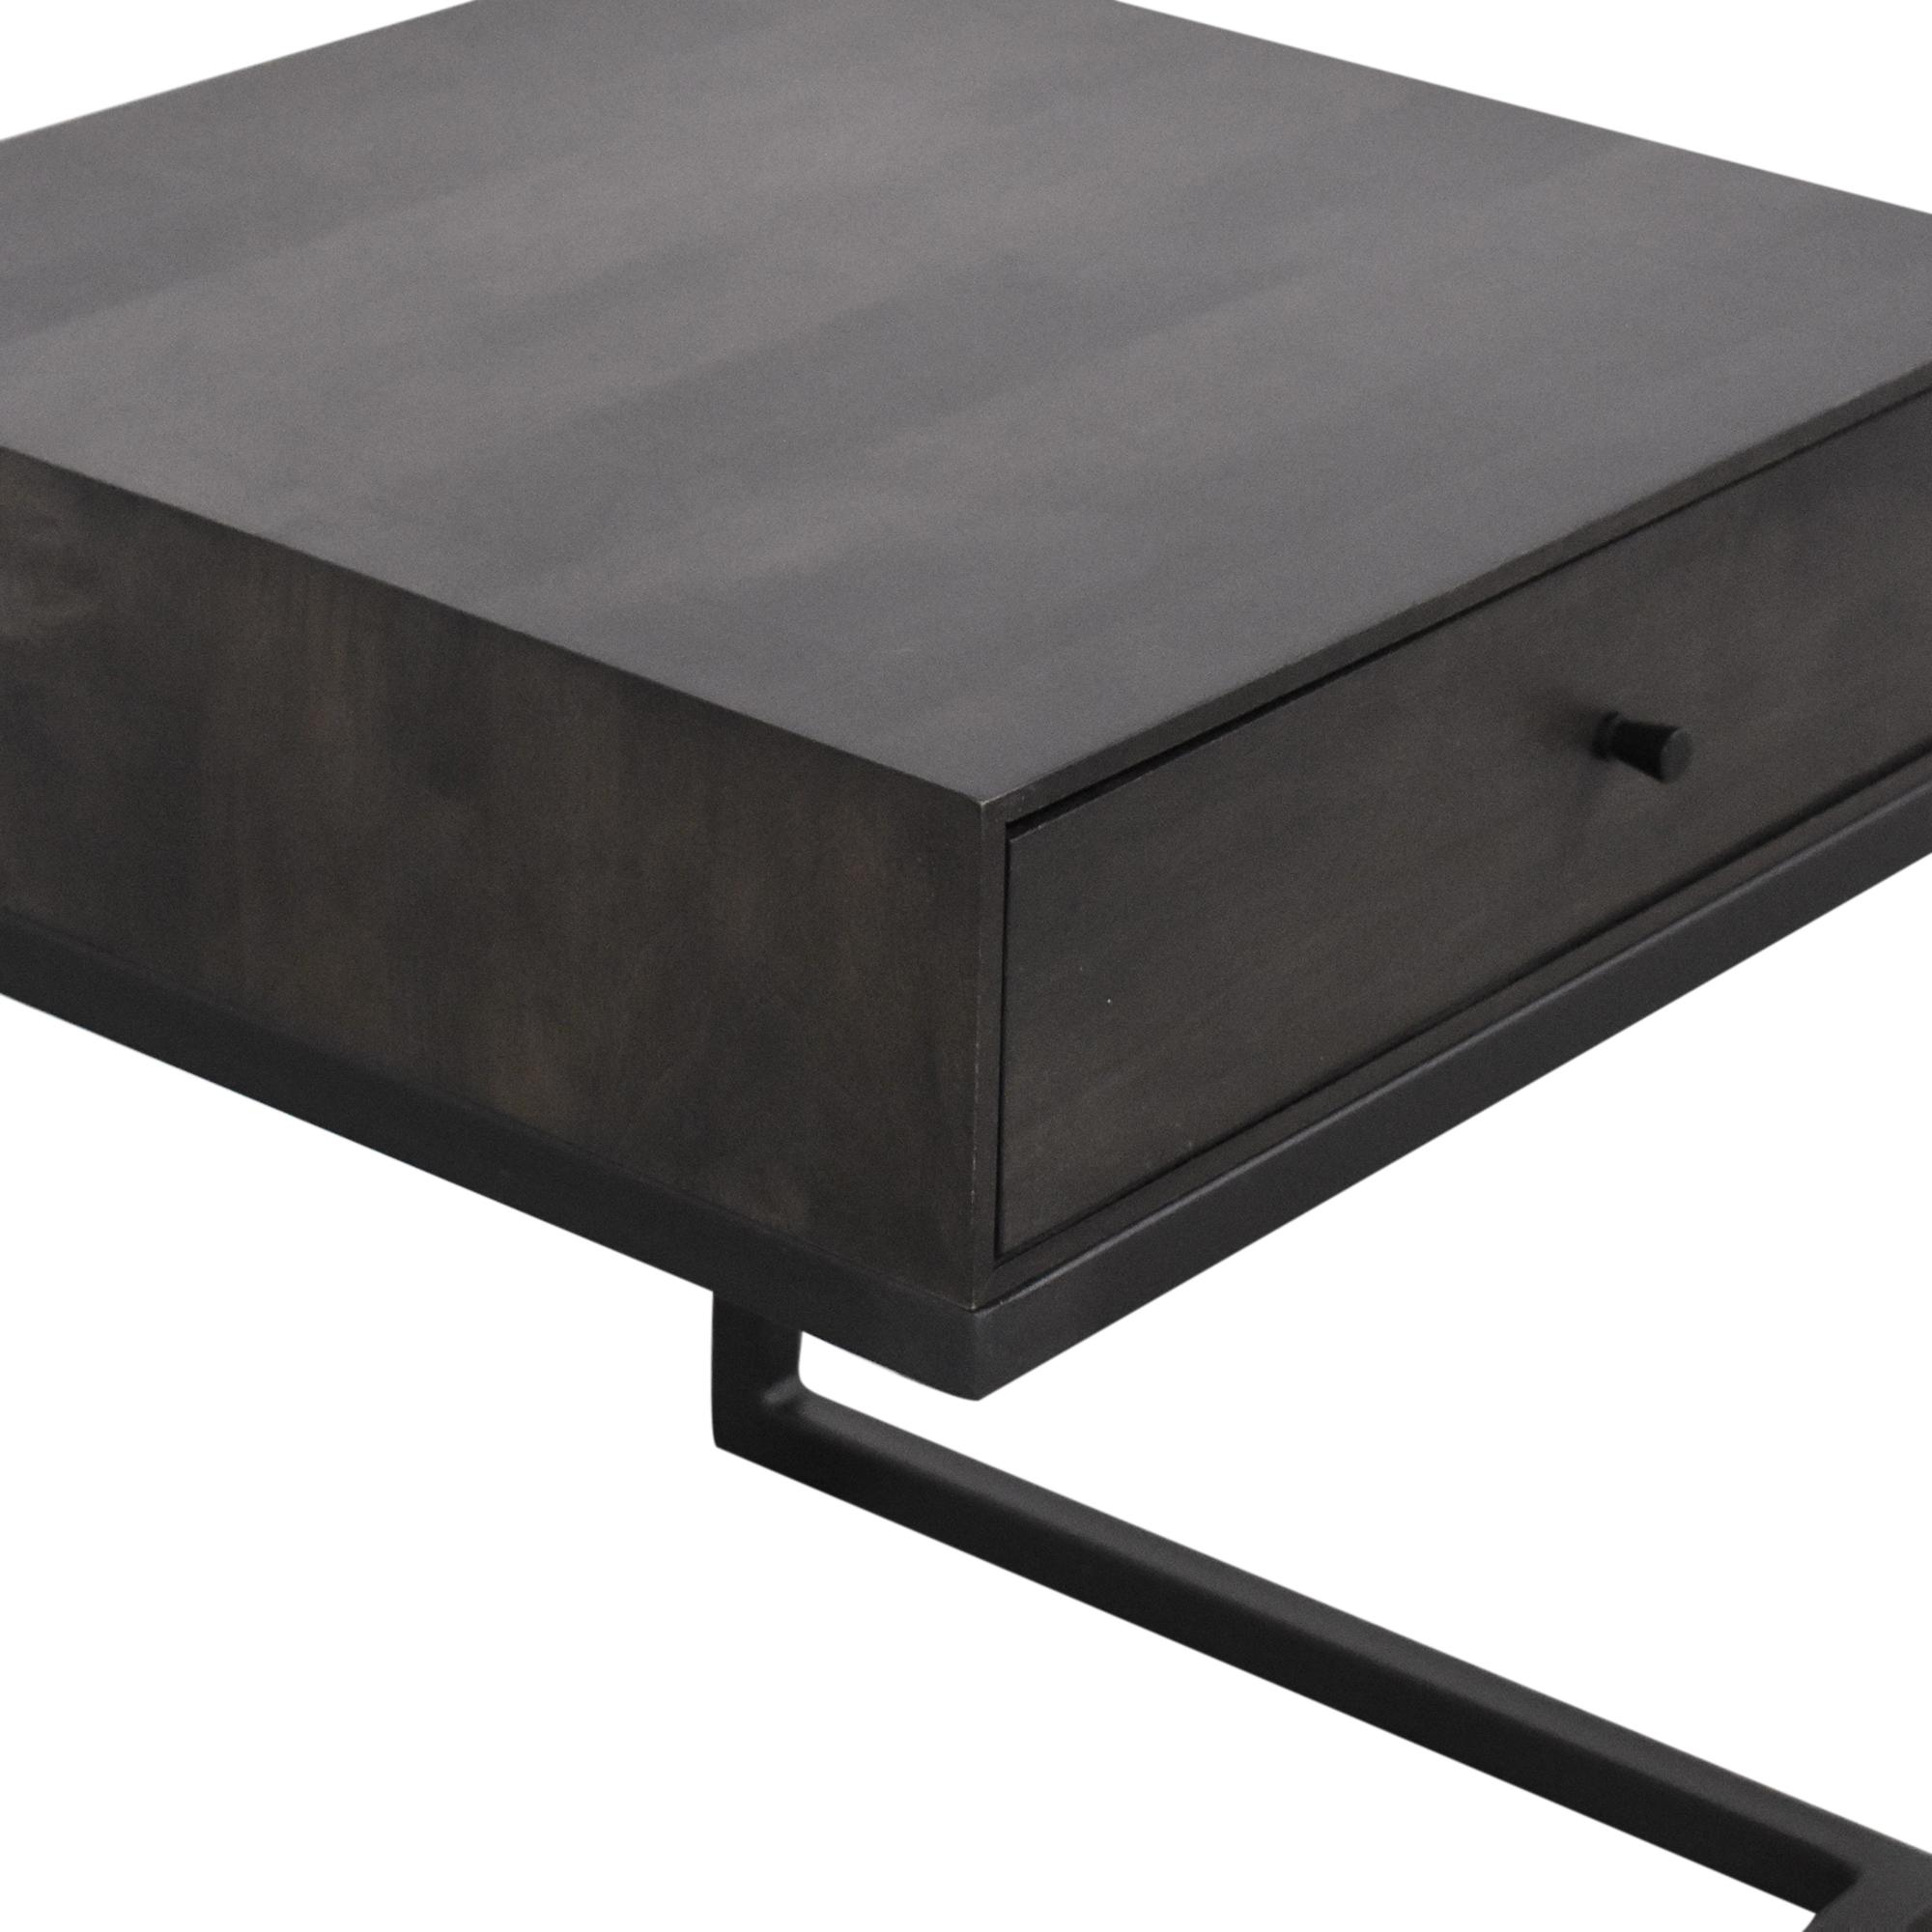 Room & Board Room & Board Hudson One Drawer C-Table Nightstand